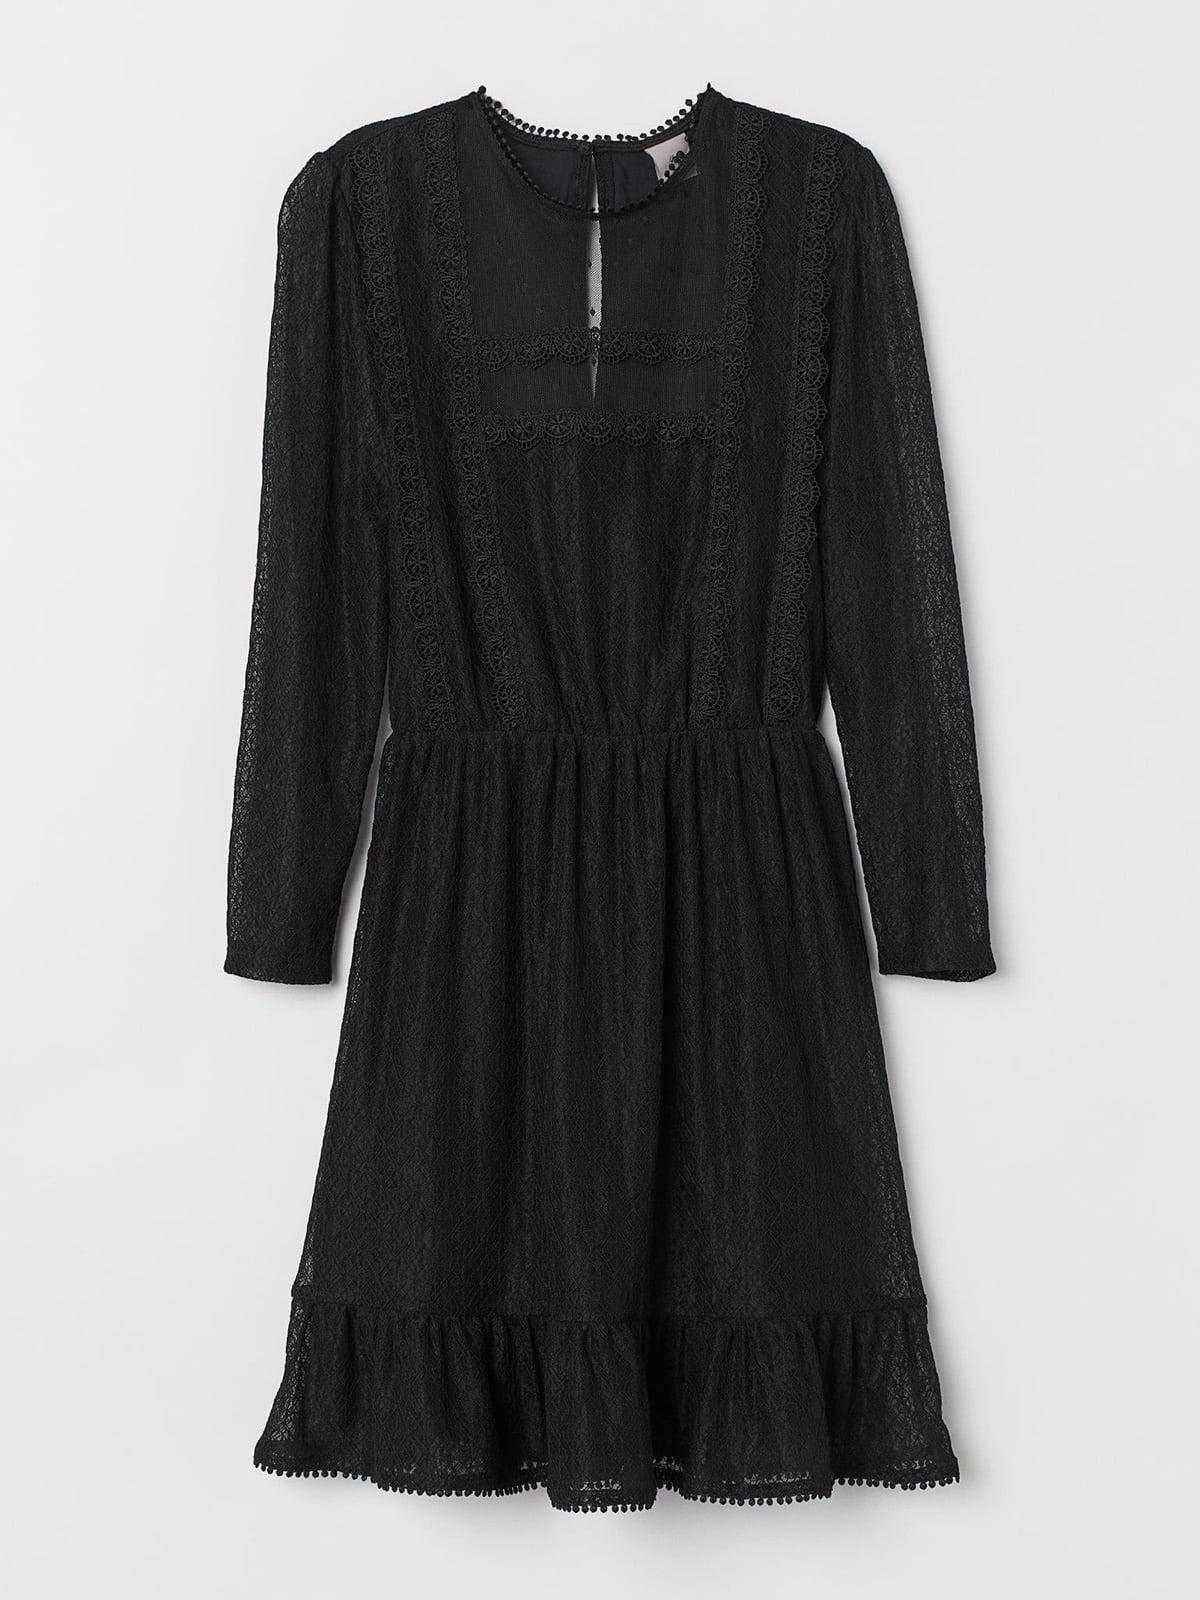 Сукня чорна мереживна | 5504939